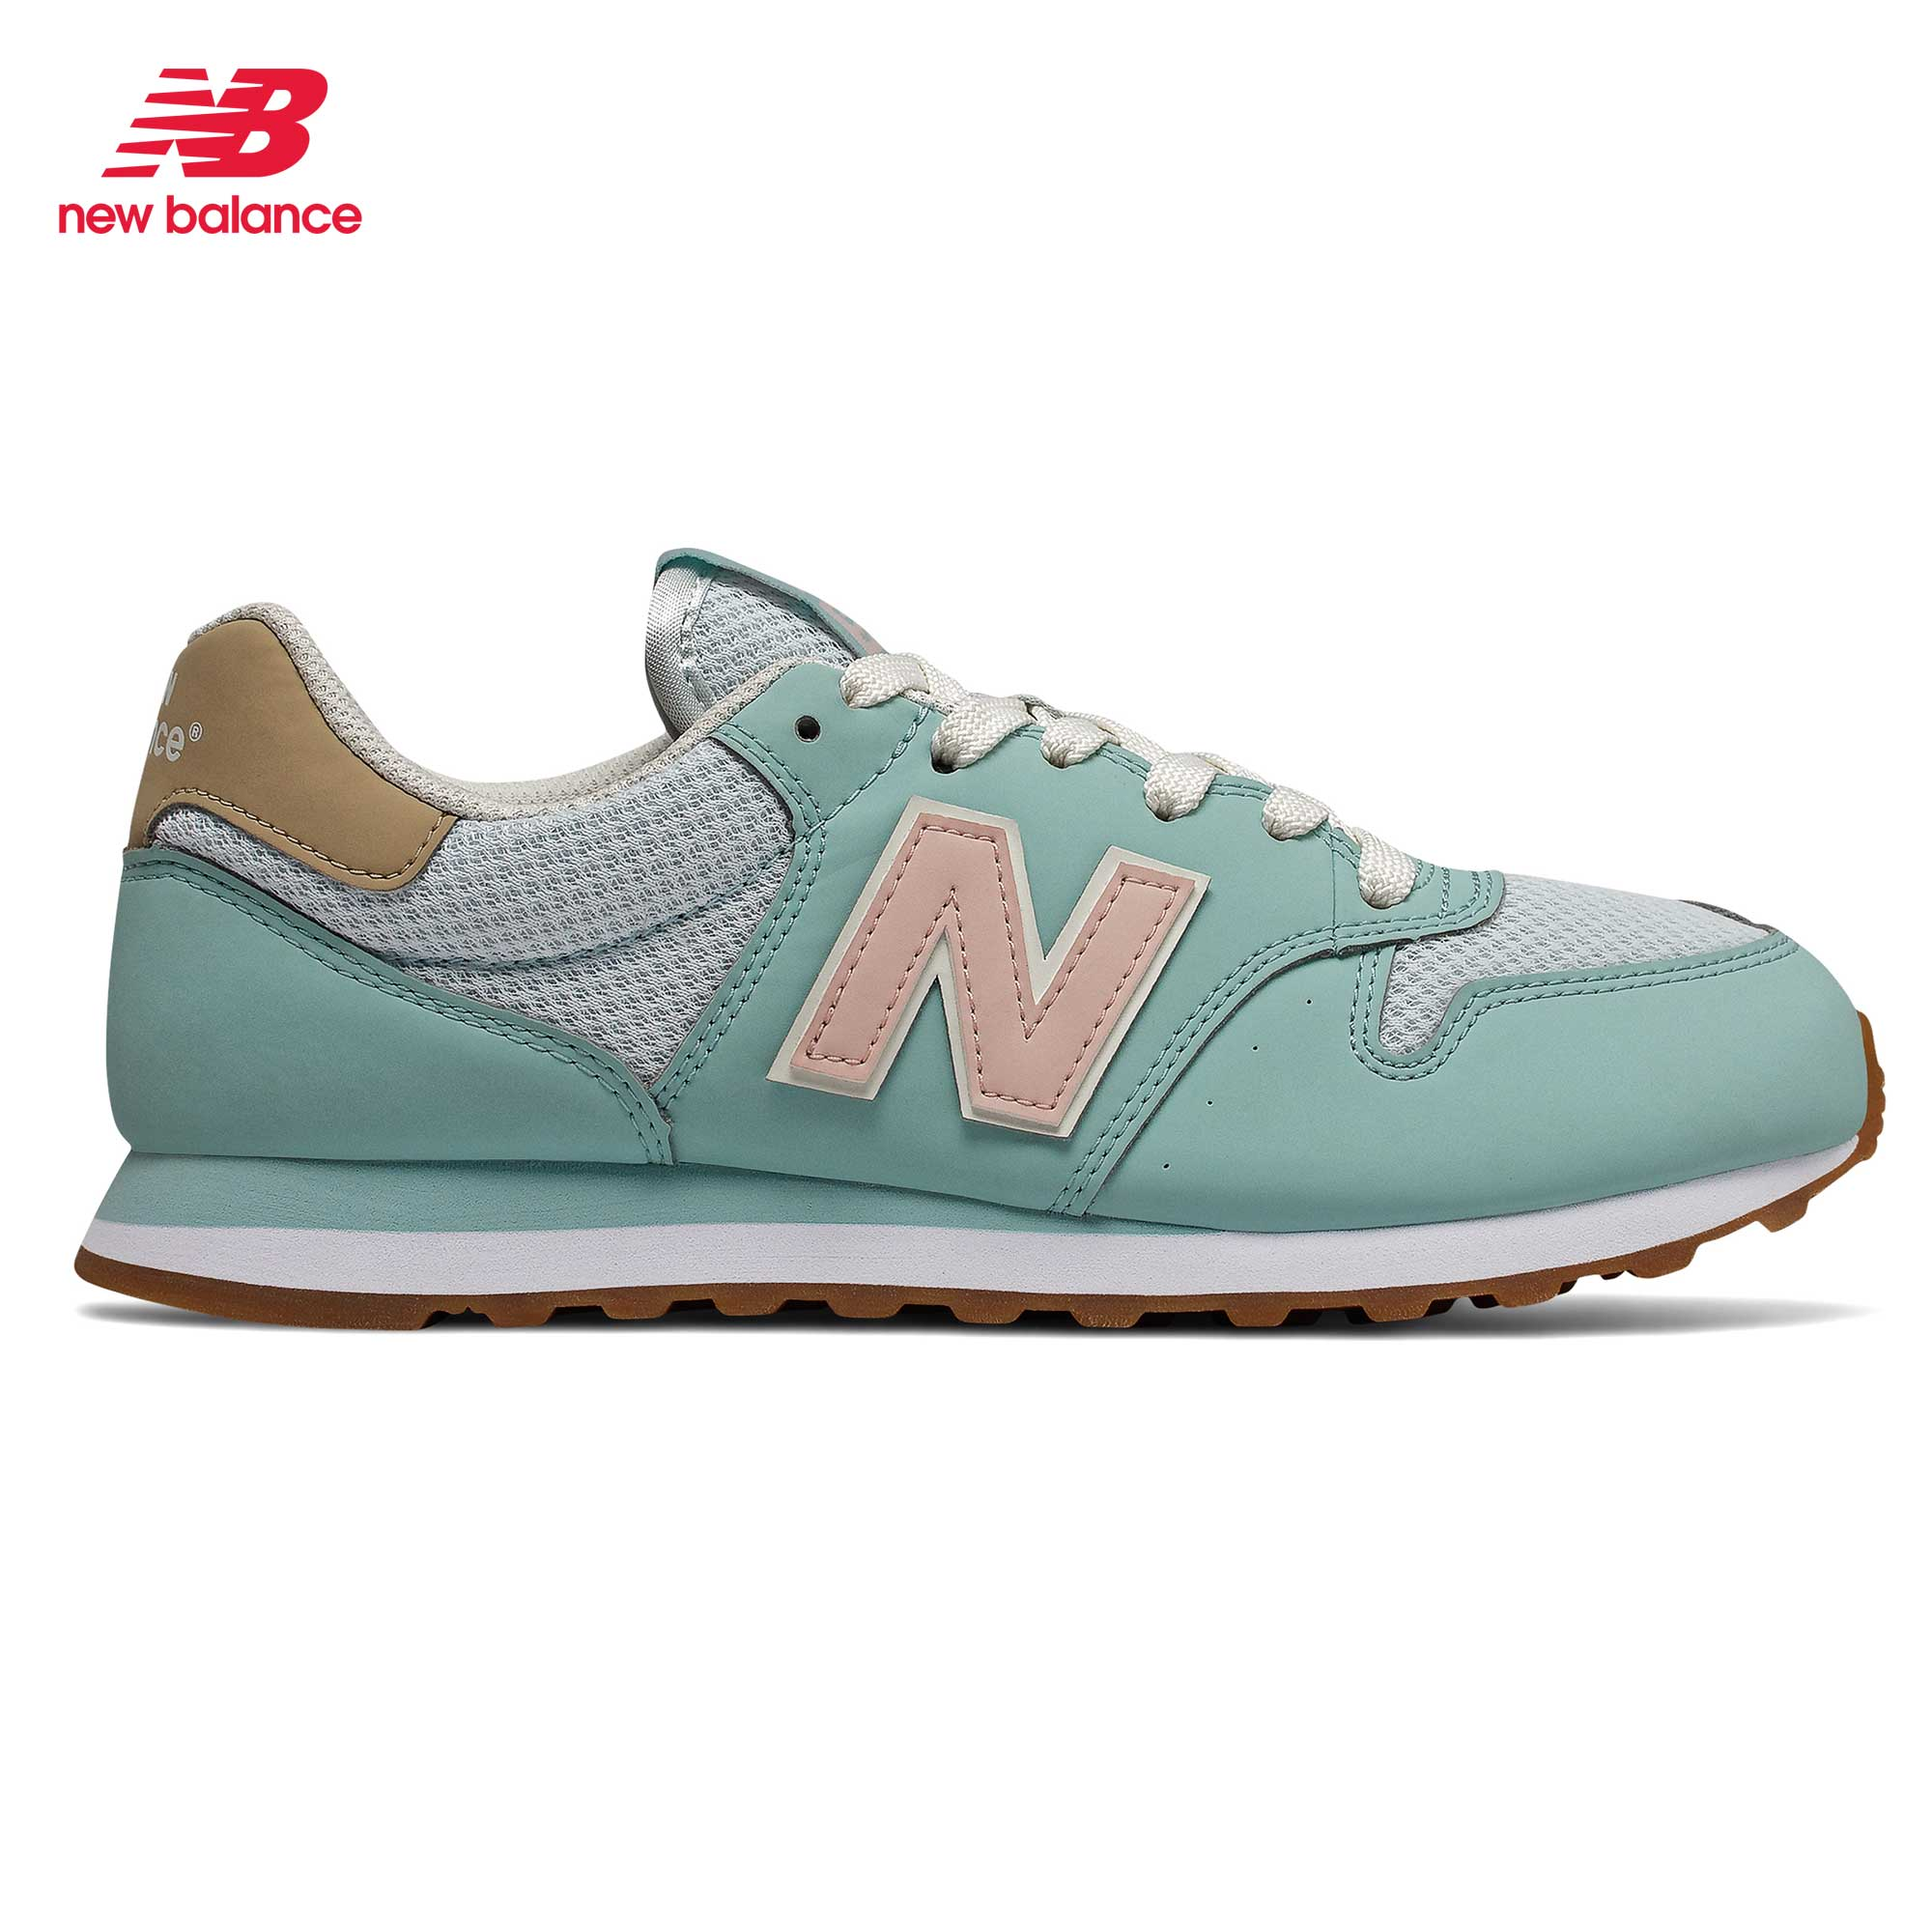 new balance 574 womens sale